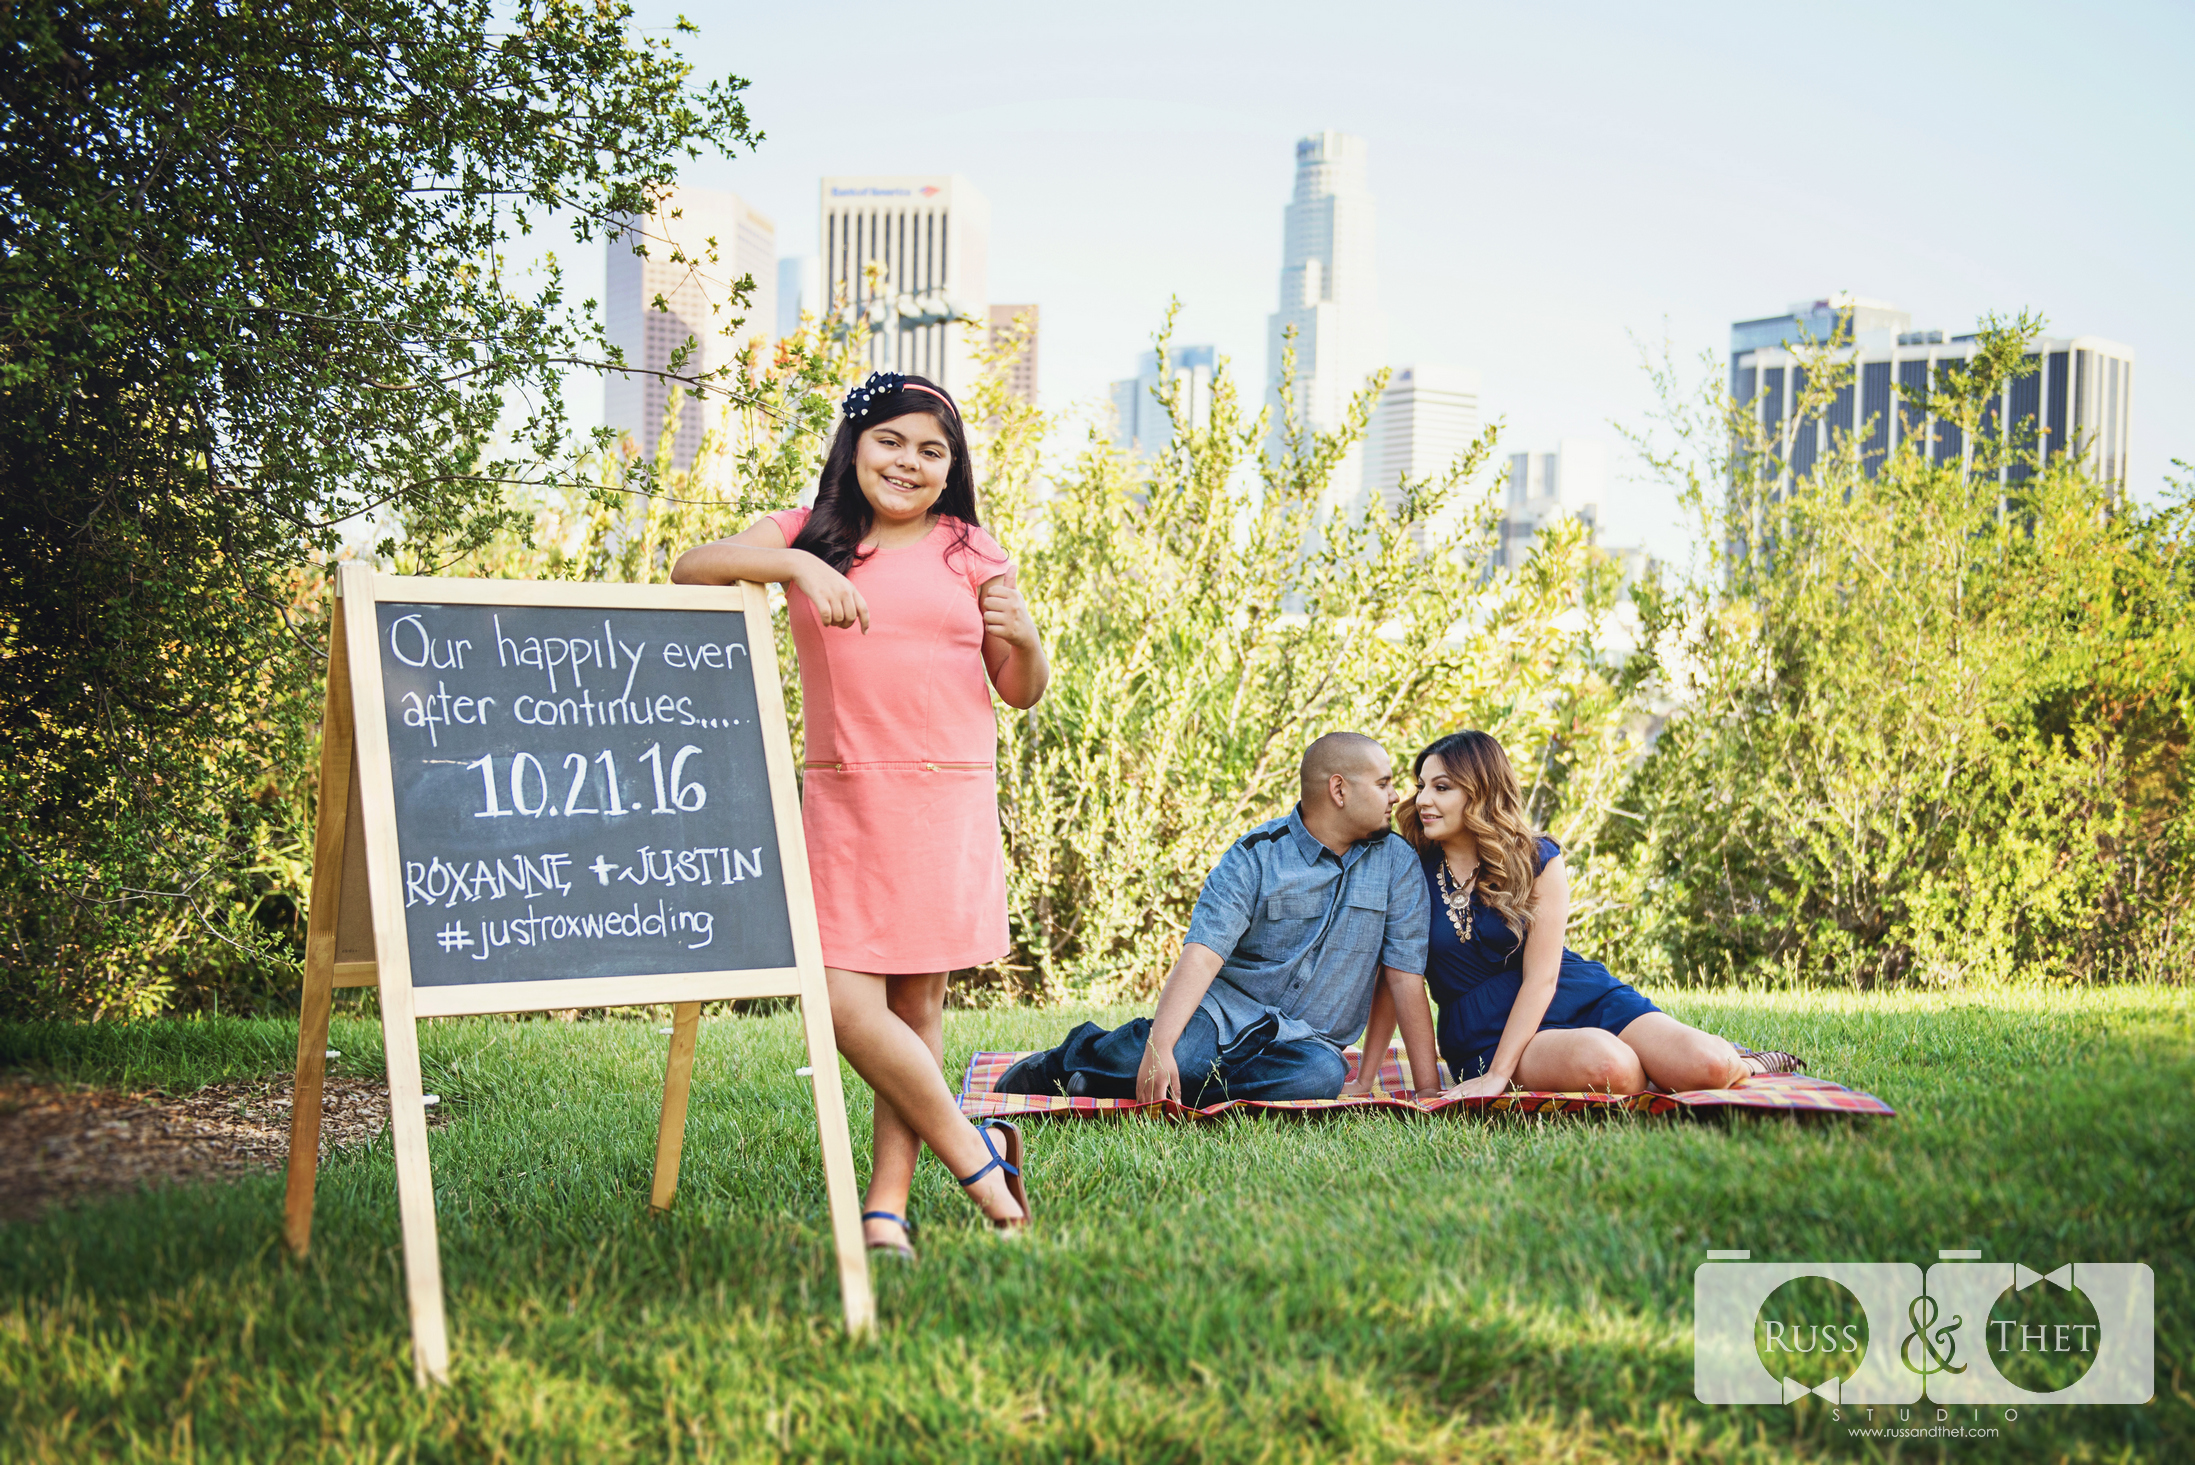 Vista-Hermosa-Park-Engagement-Photographer (4).jpg